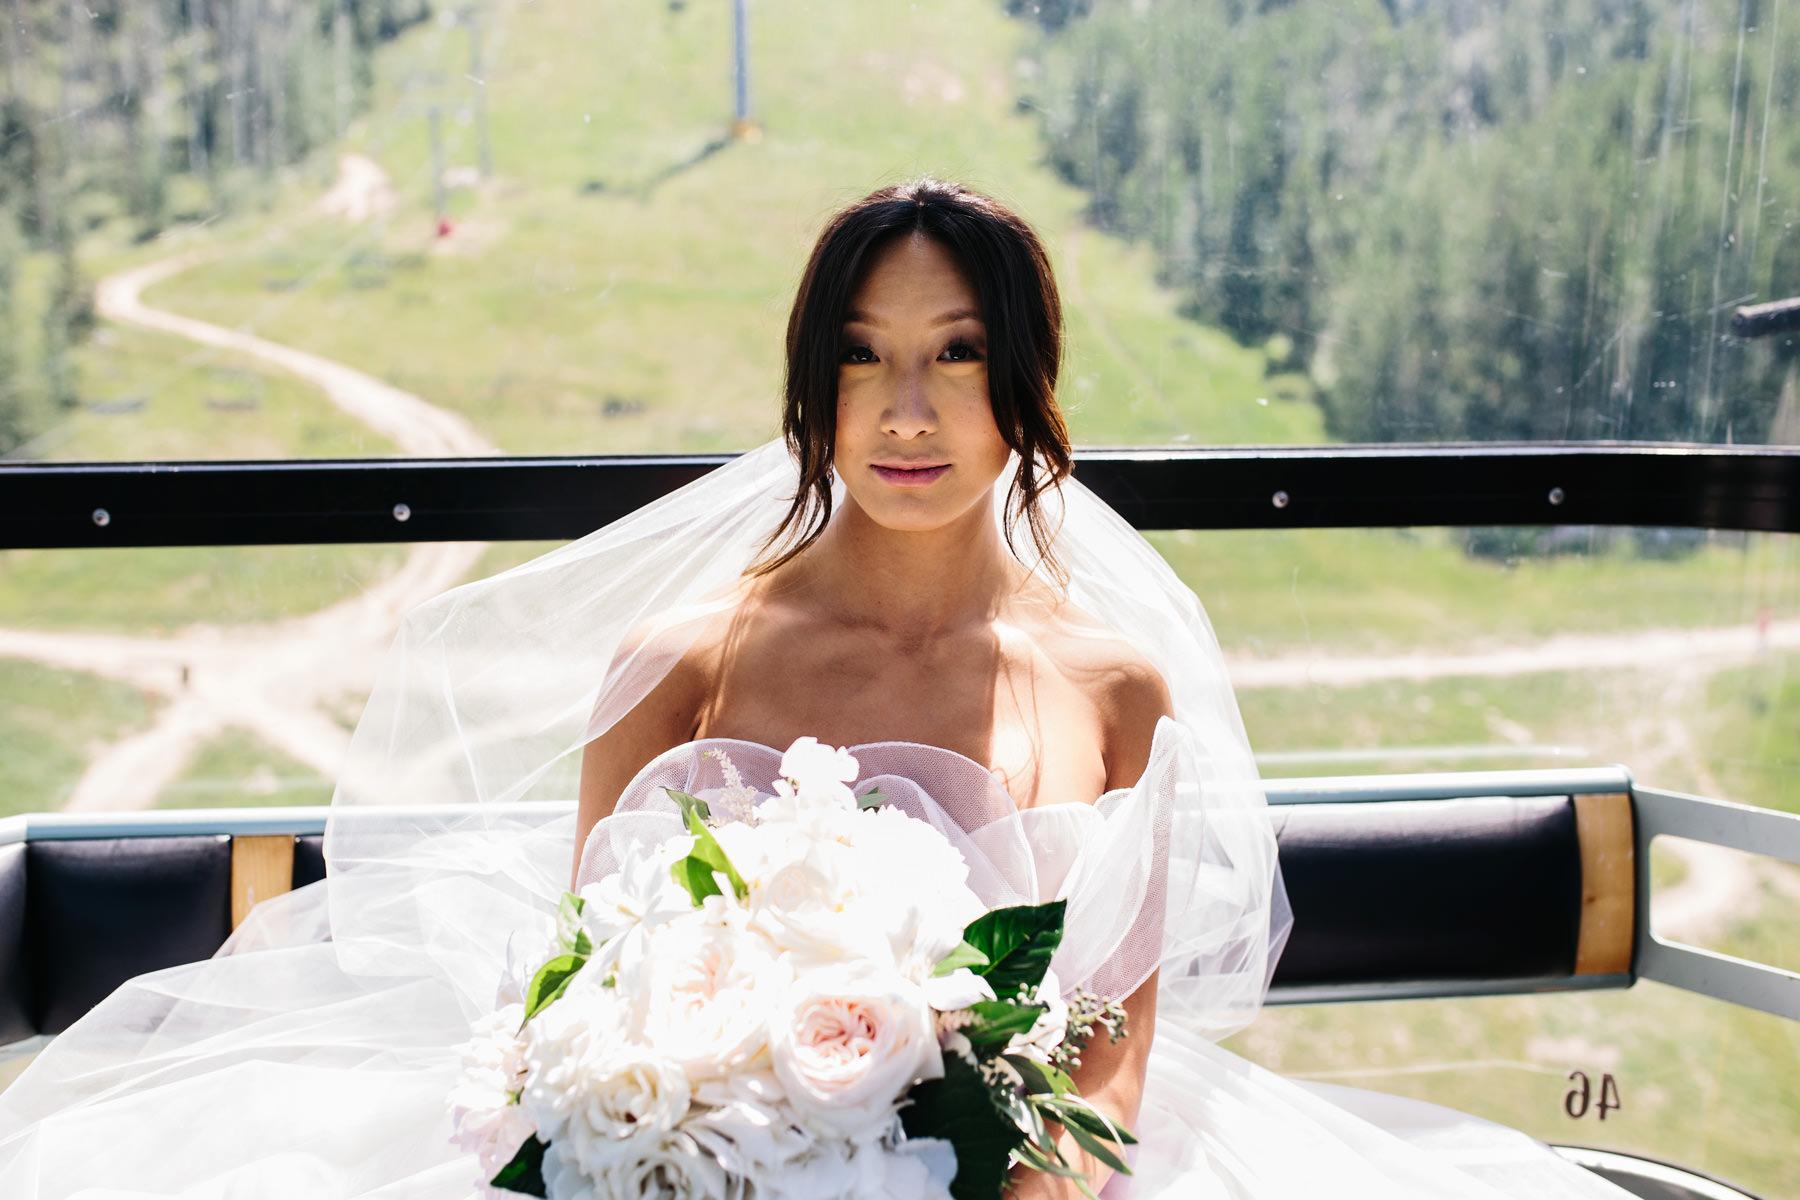 Vail Colorado Wedding Deck_ Kindling Wedding Photography16.JPG